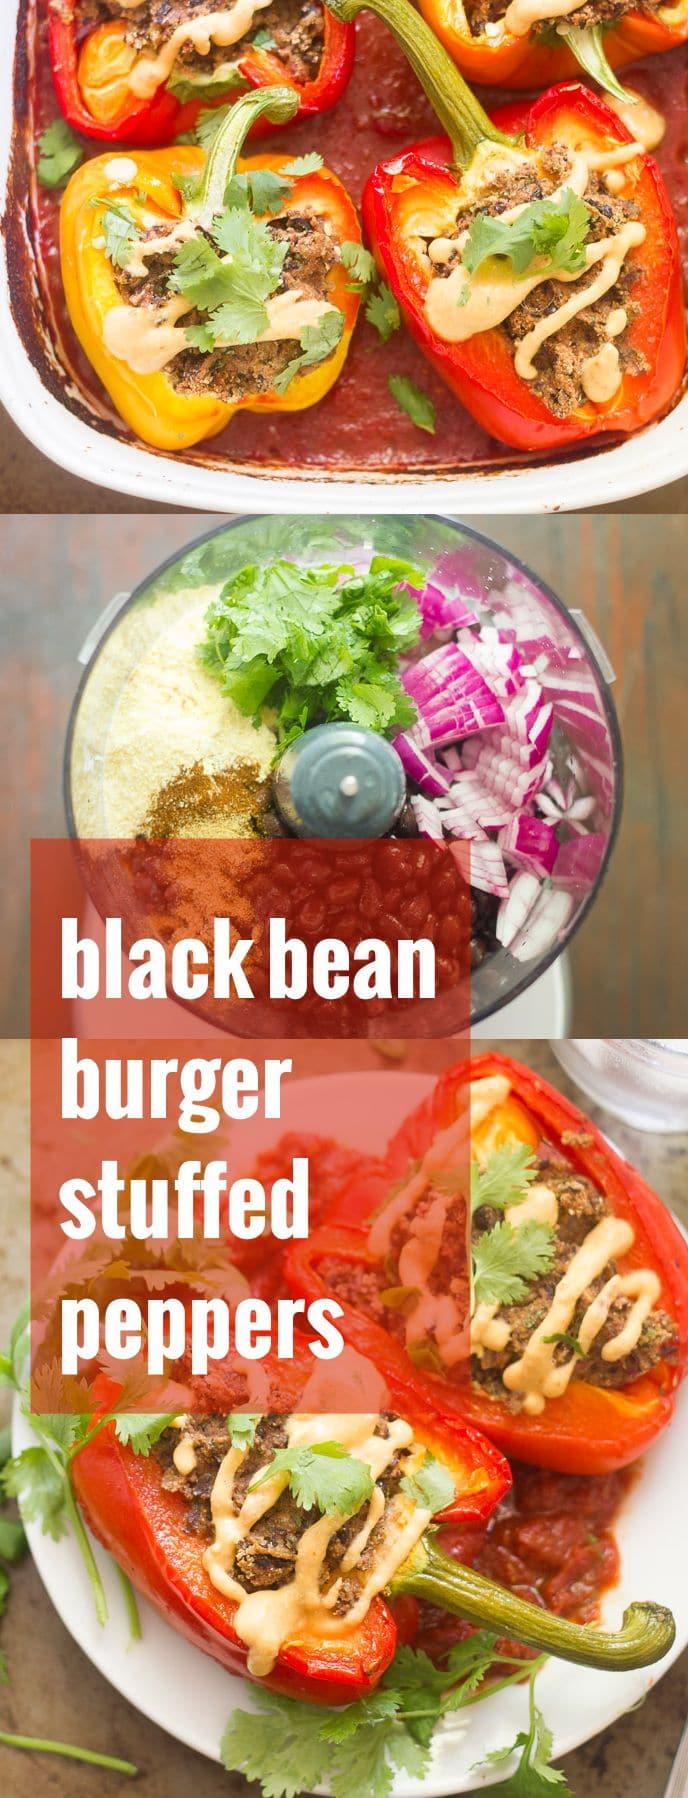 Black Bean Burger Stuffed Peppers